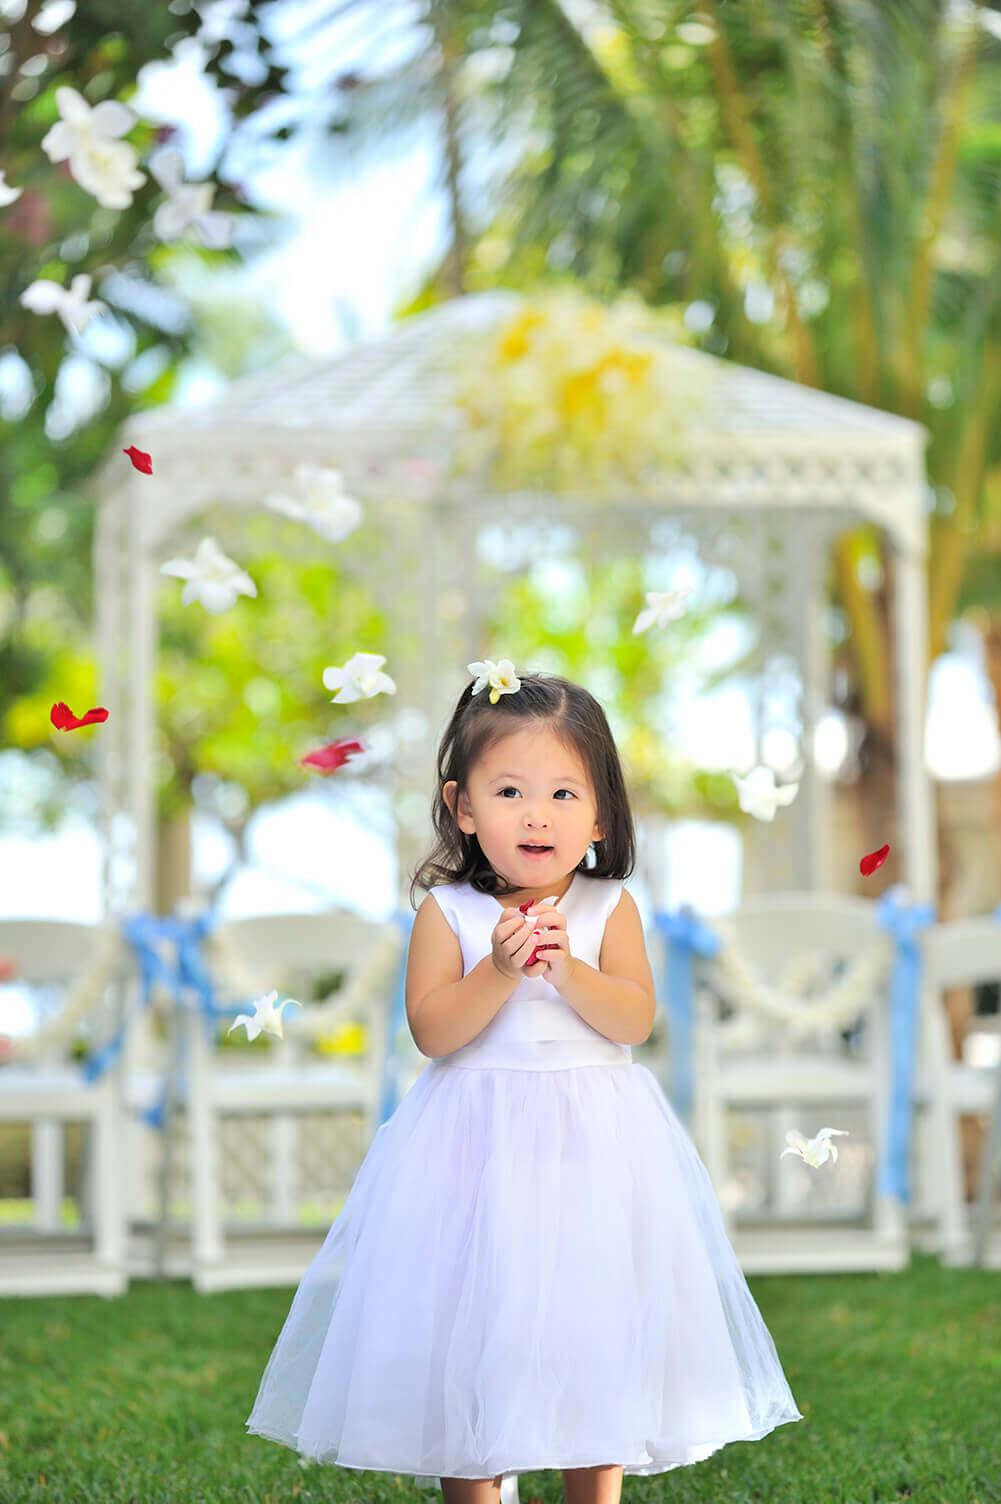 Flower girl in the Garden Courtyard for a wedding